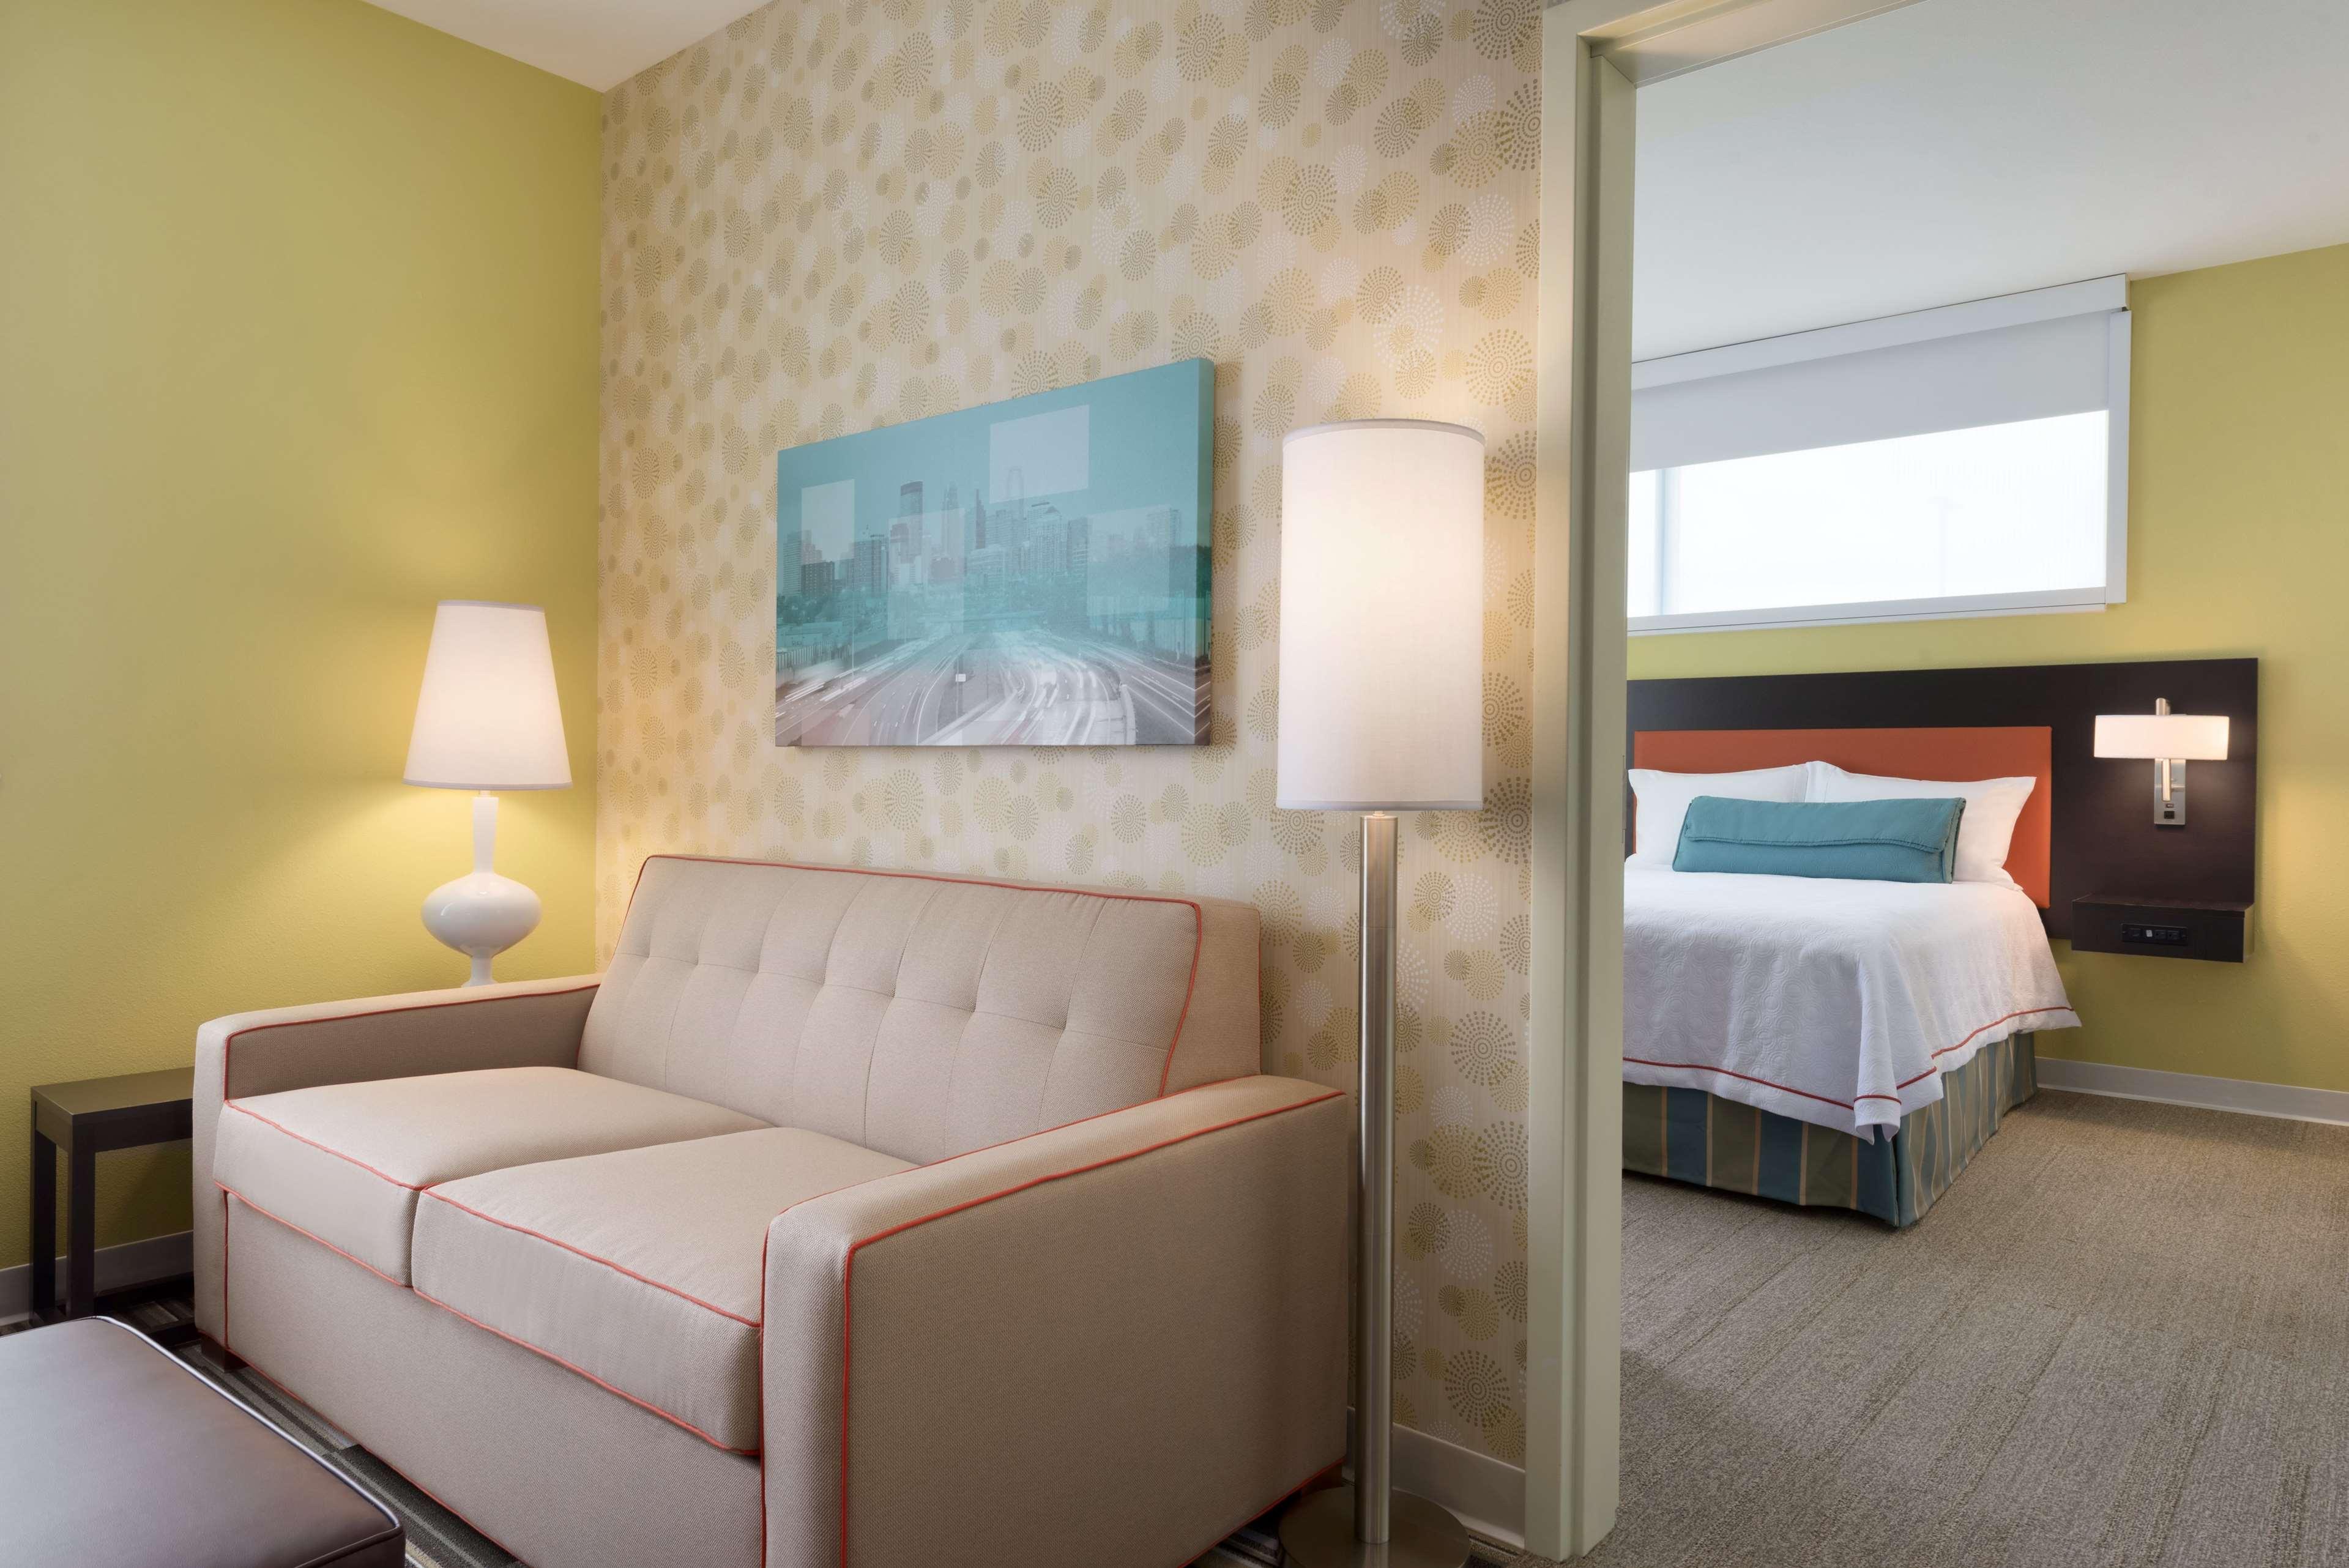 Home2 Suites by Hilton Roseville Minneapolis image 5